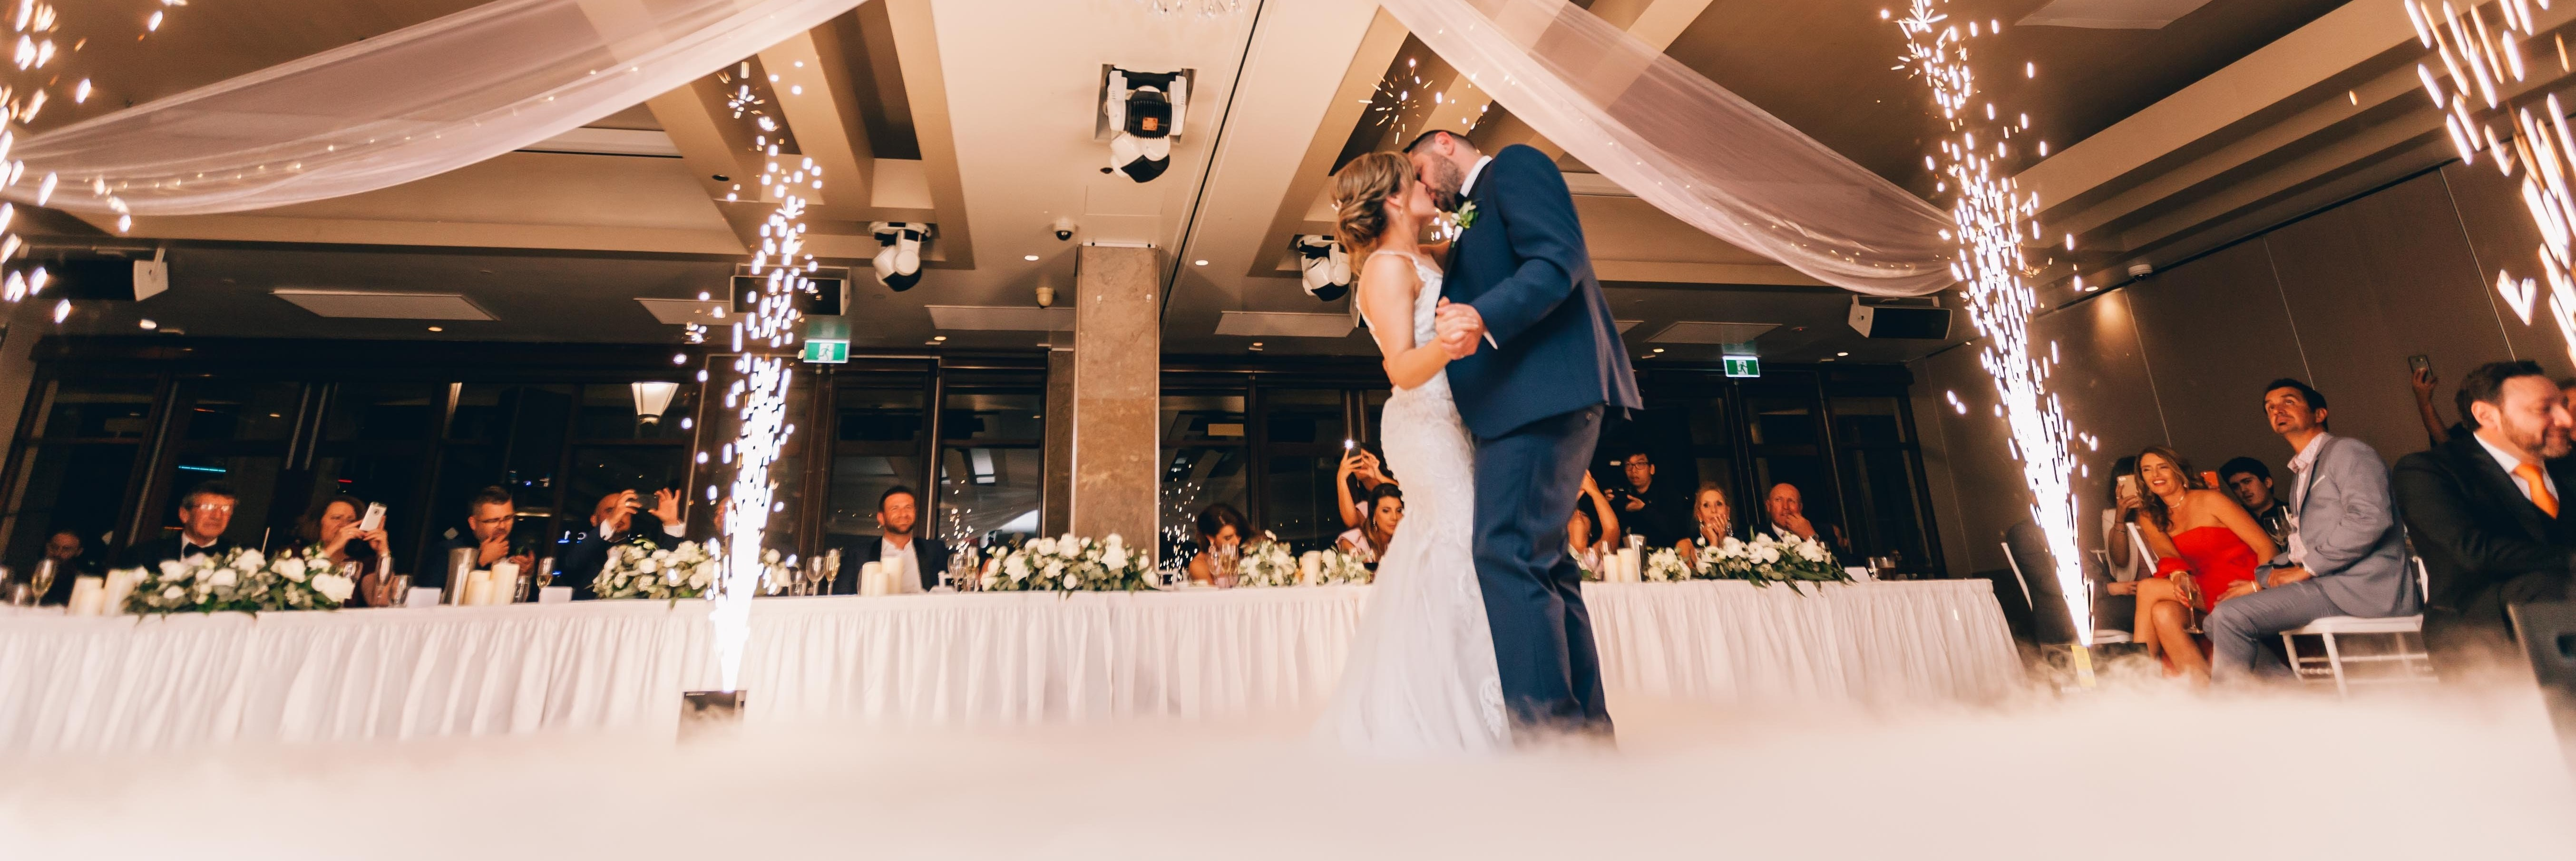 videofilmowanie wesele